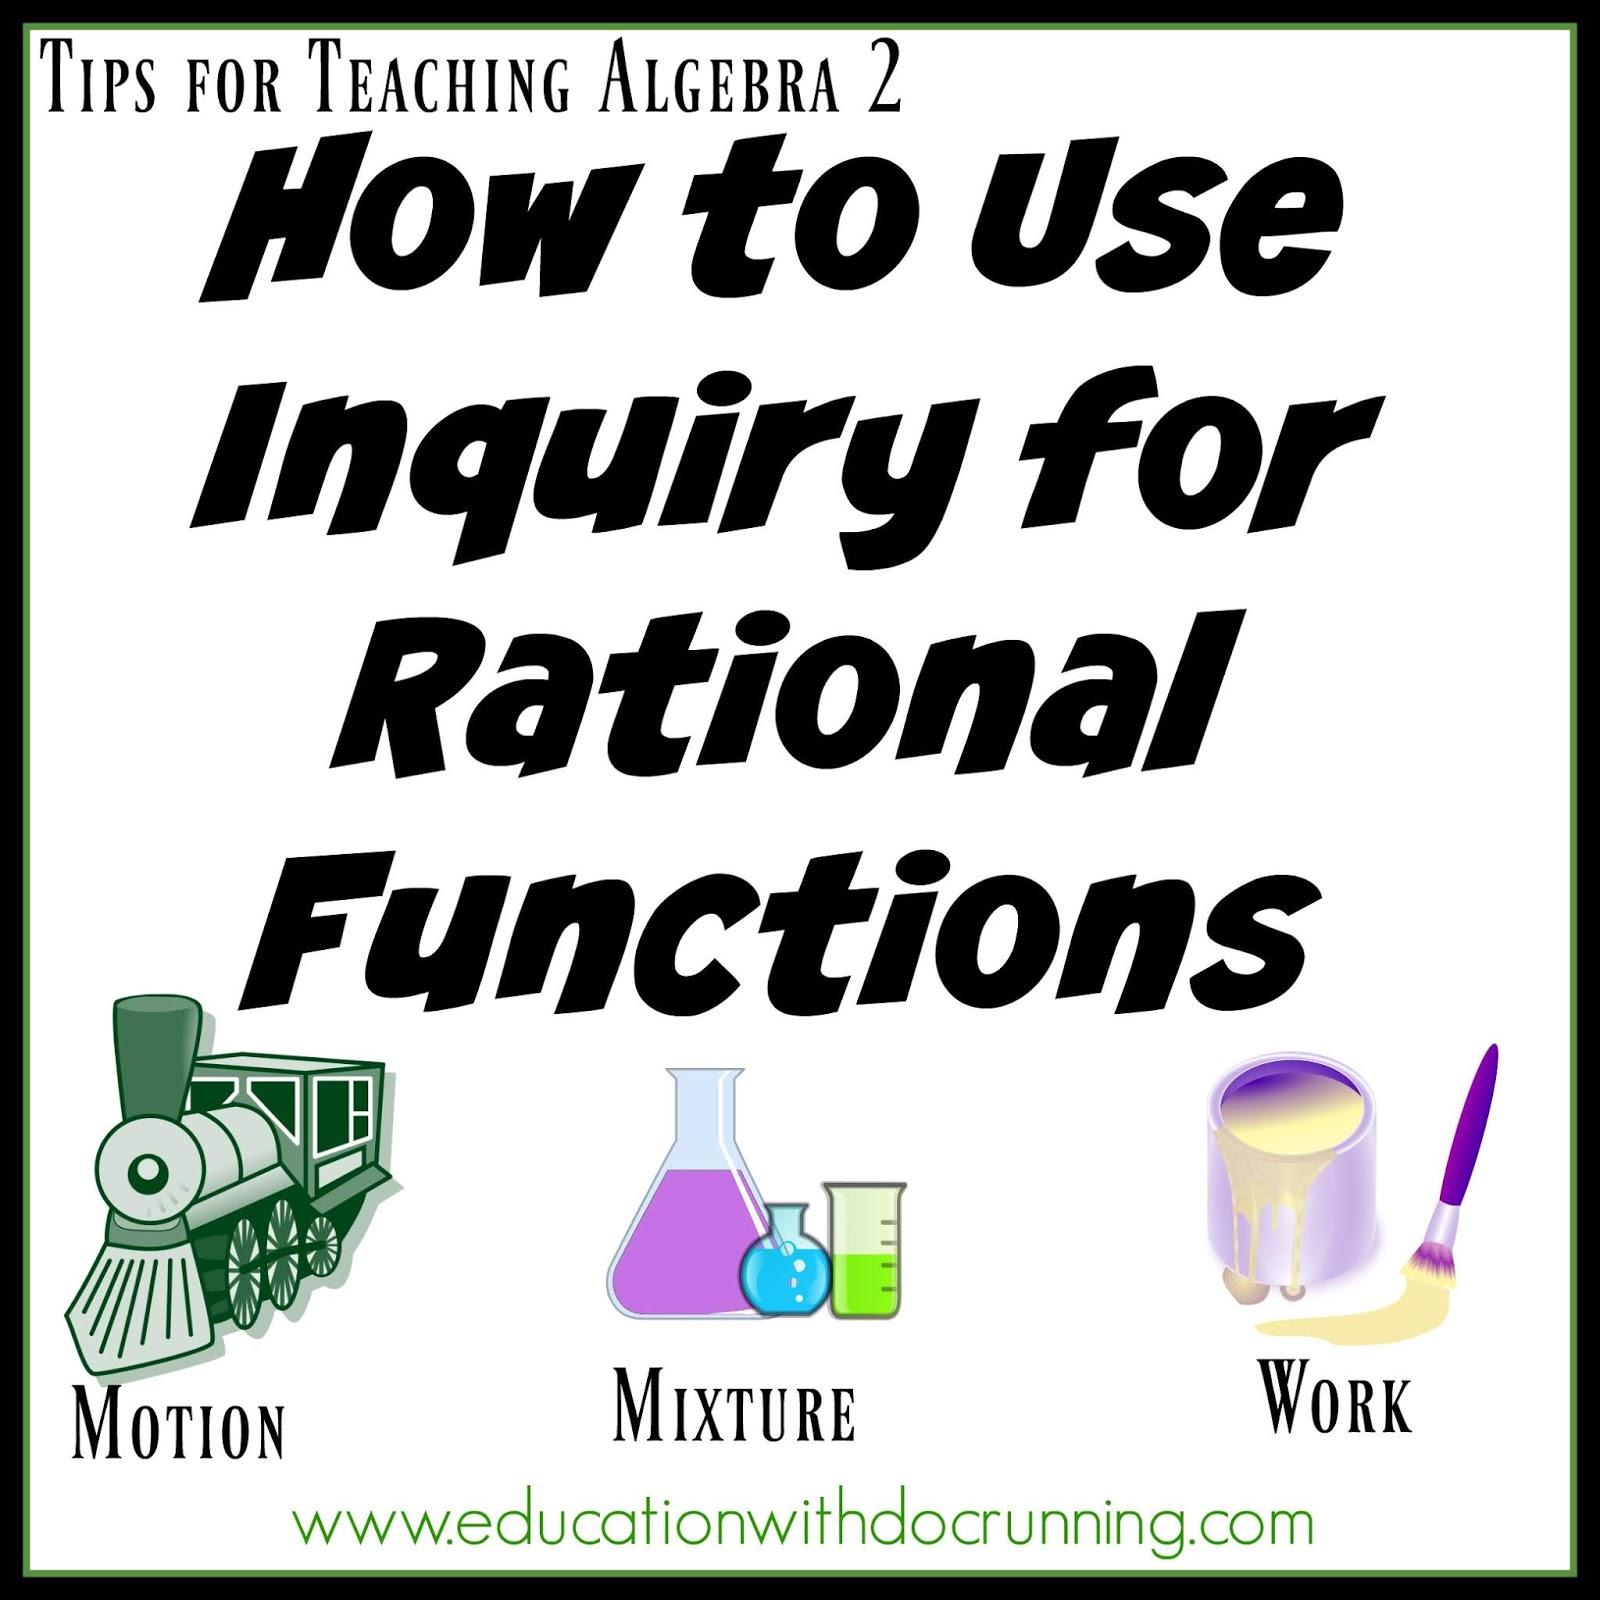 Math Mondays: Teaching Work, Motion and Mixture Problems